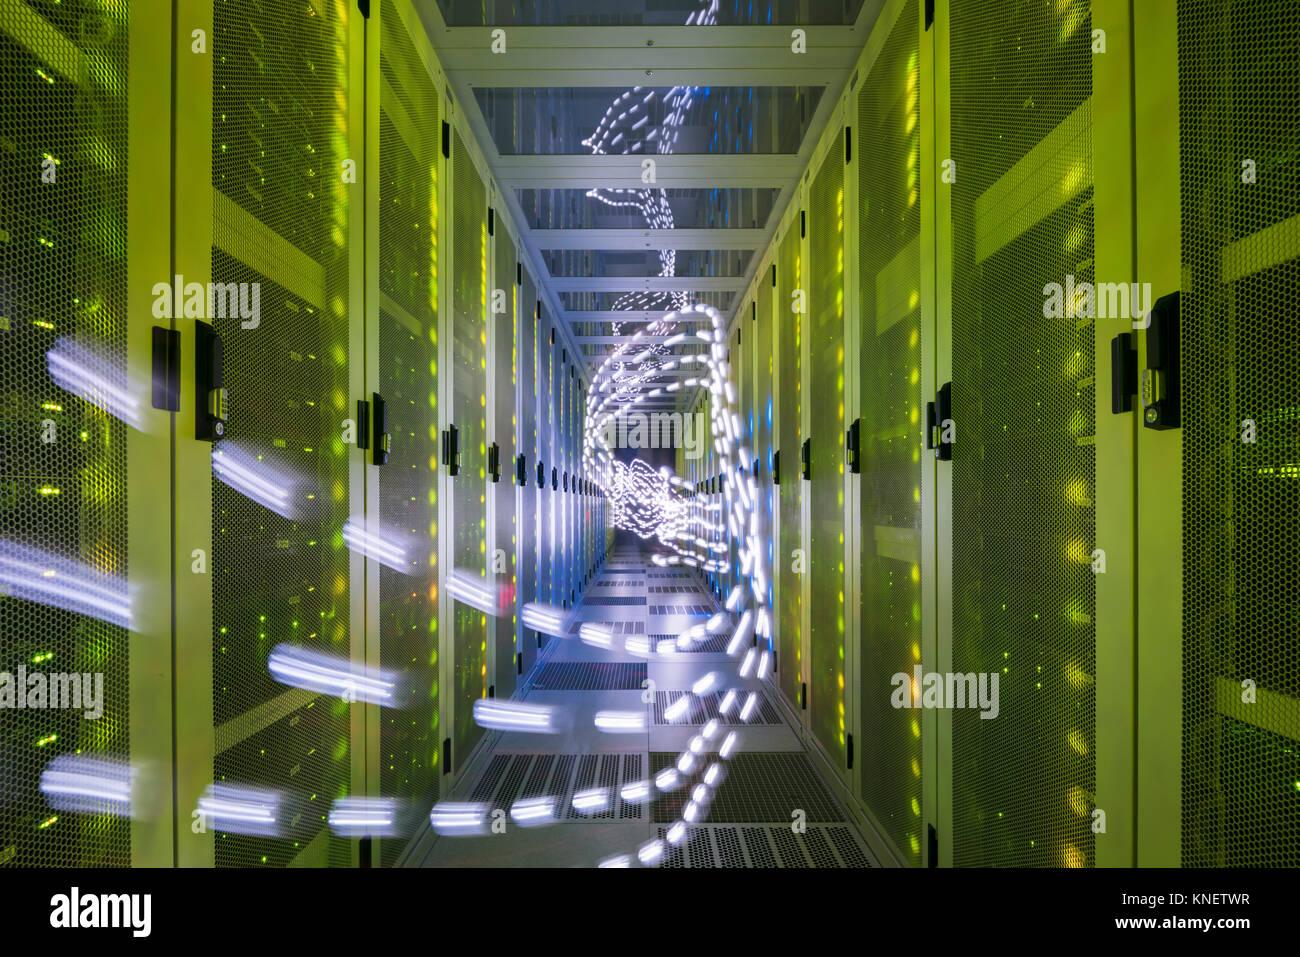 Interior del centro de datos, luces senderos mostrando datos de viaje Foto de stock